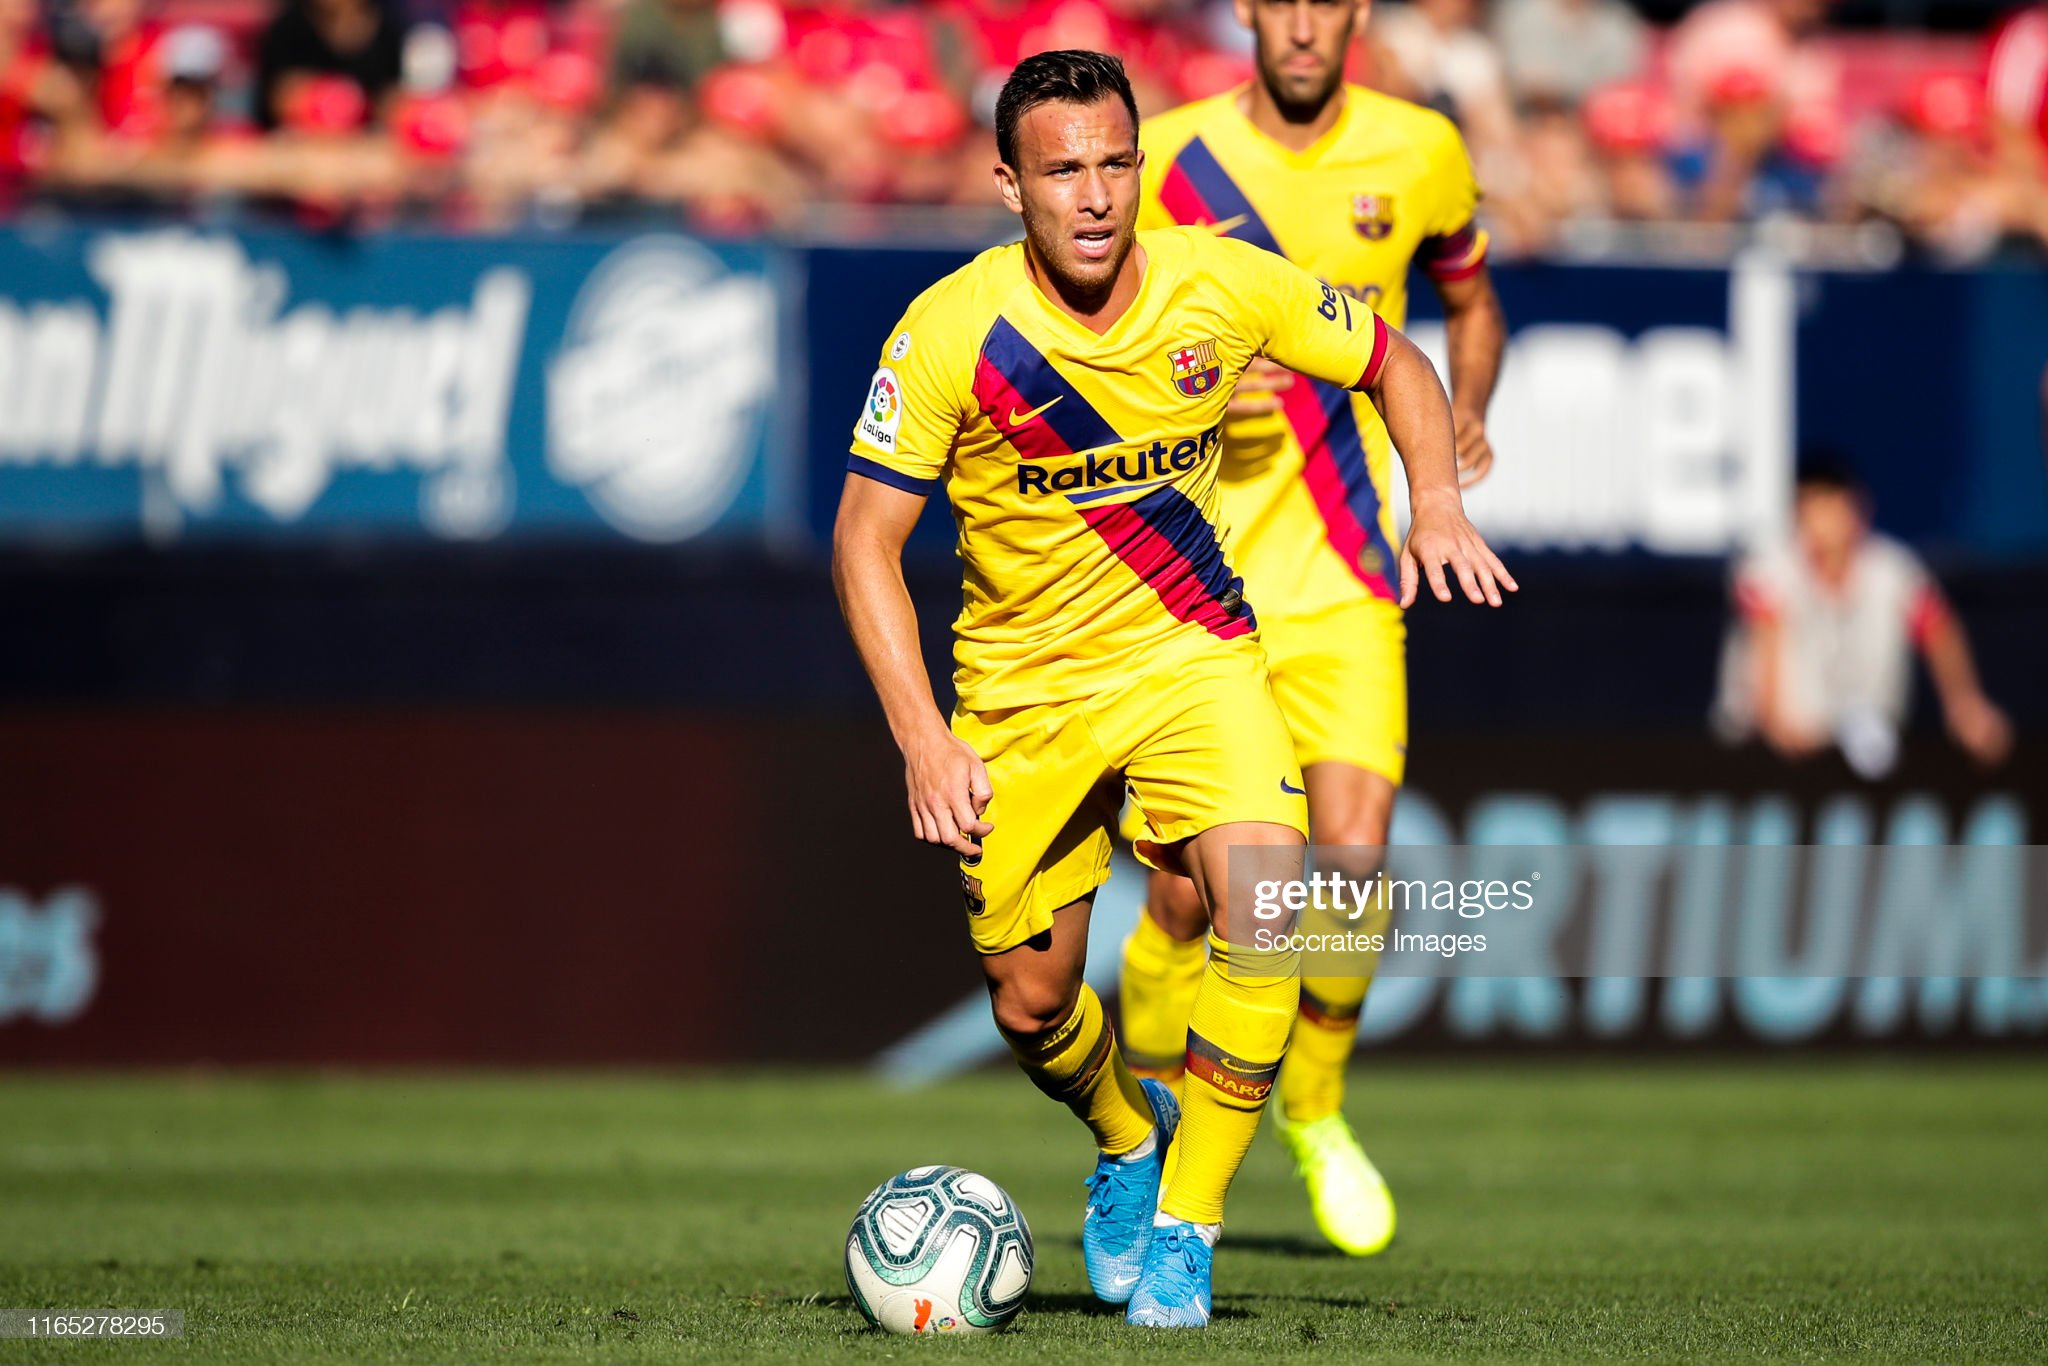 صور مباراة : أوساسونا - برشلونة 2-2 ( 31-08-2019 )  Arthur-of-fc-barcelona-during-the-la-liga-santander-match-between-v-picture-id1165278295?s=2048x2048